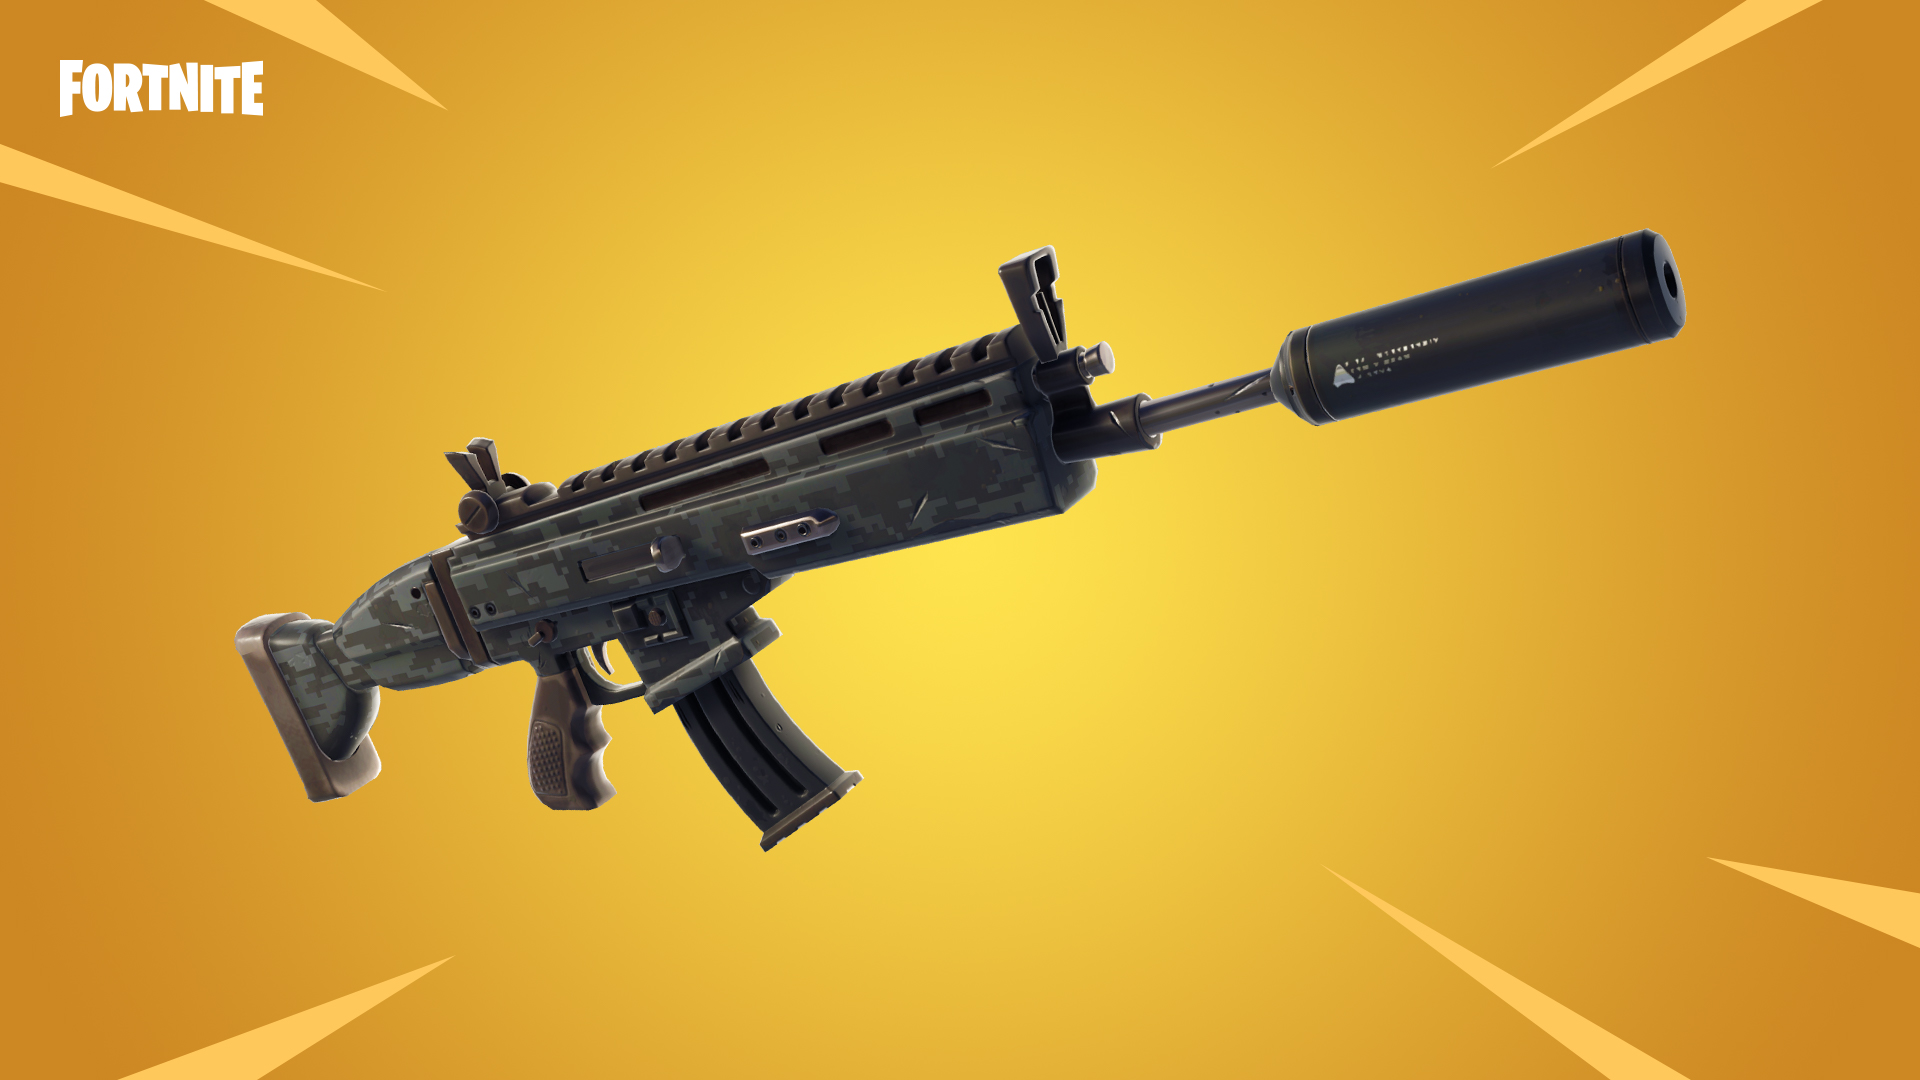 Fortnite Susturuculu Taarruz Tüfeği